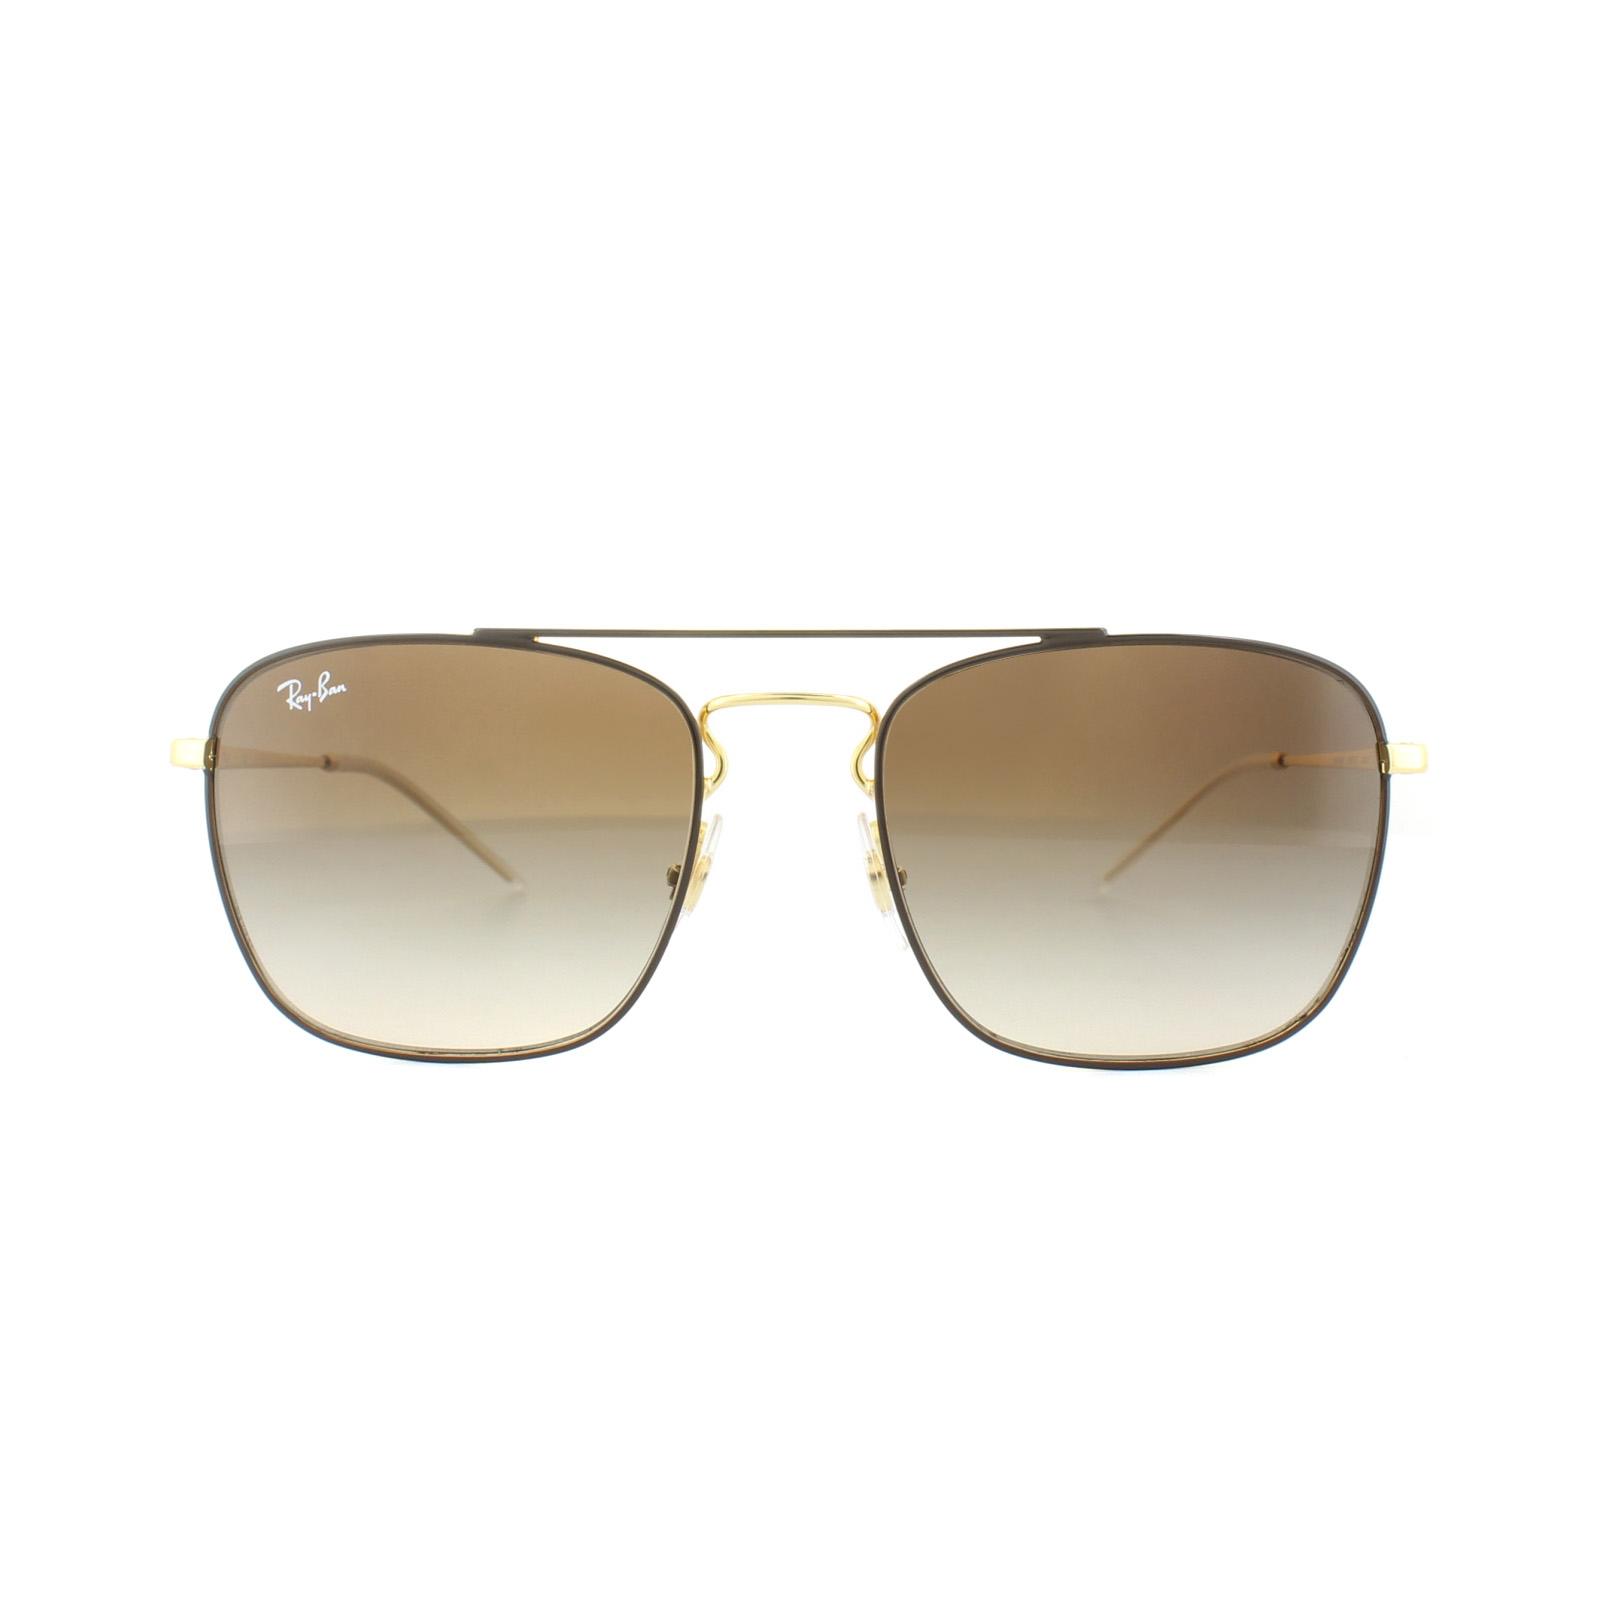 21354ebae1 Sentinel Ray-Ban Sunglasses 3588 905513 Brown Gold Brown Gradient